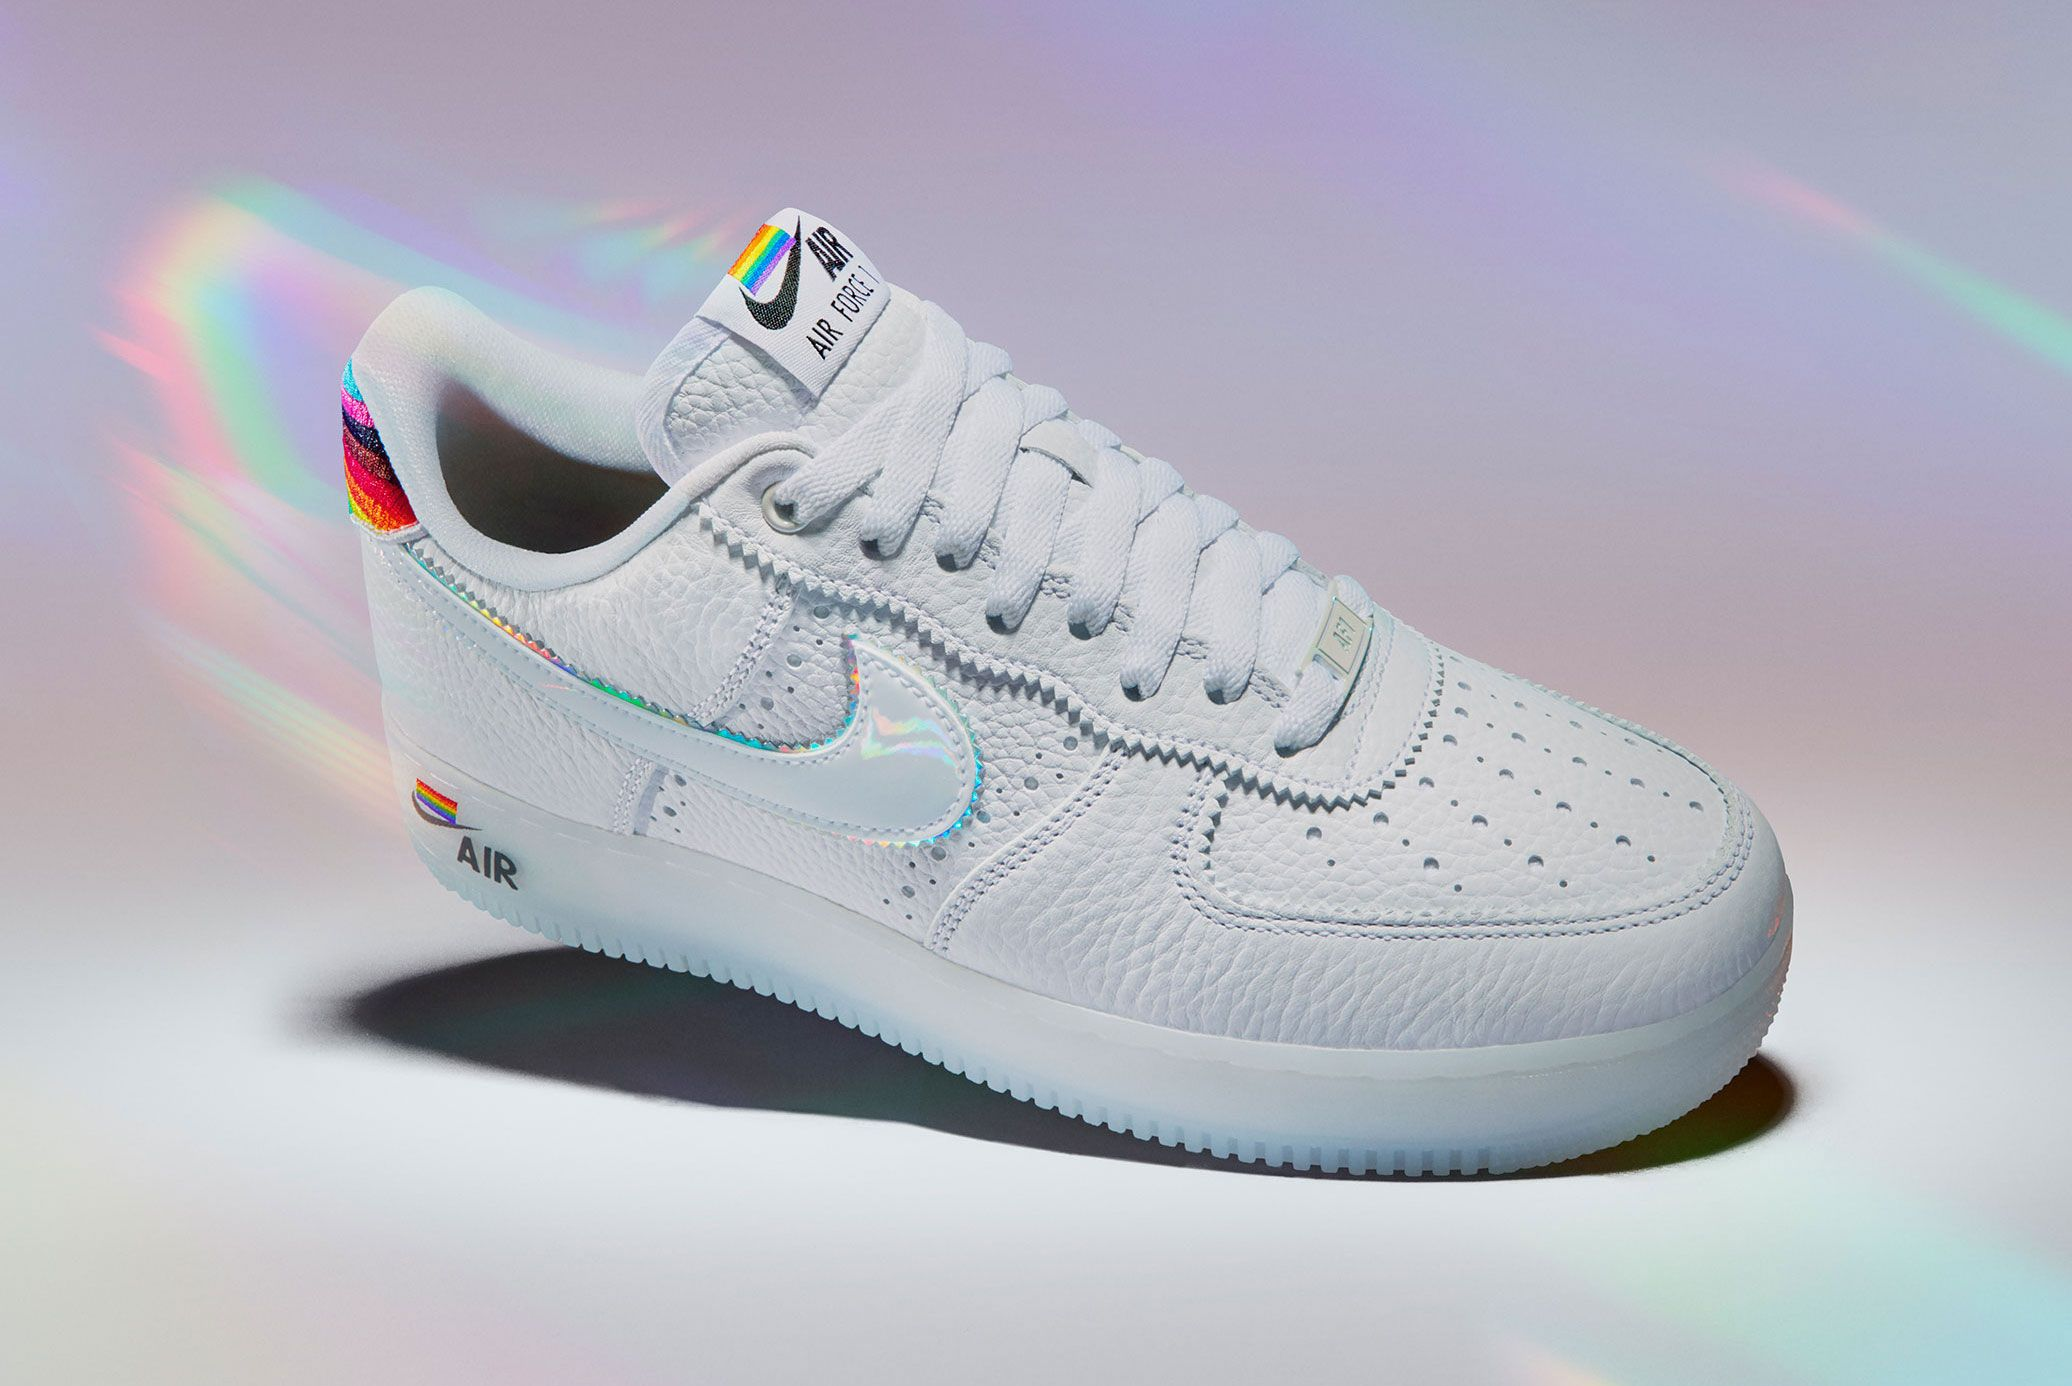 Nike Air Force 1 'Pride 2020'